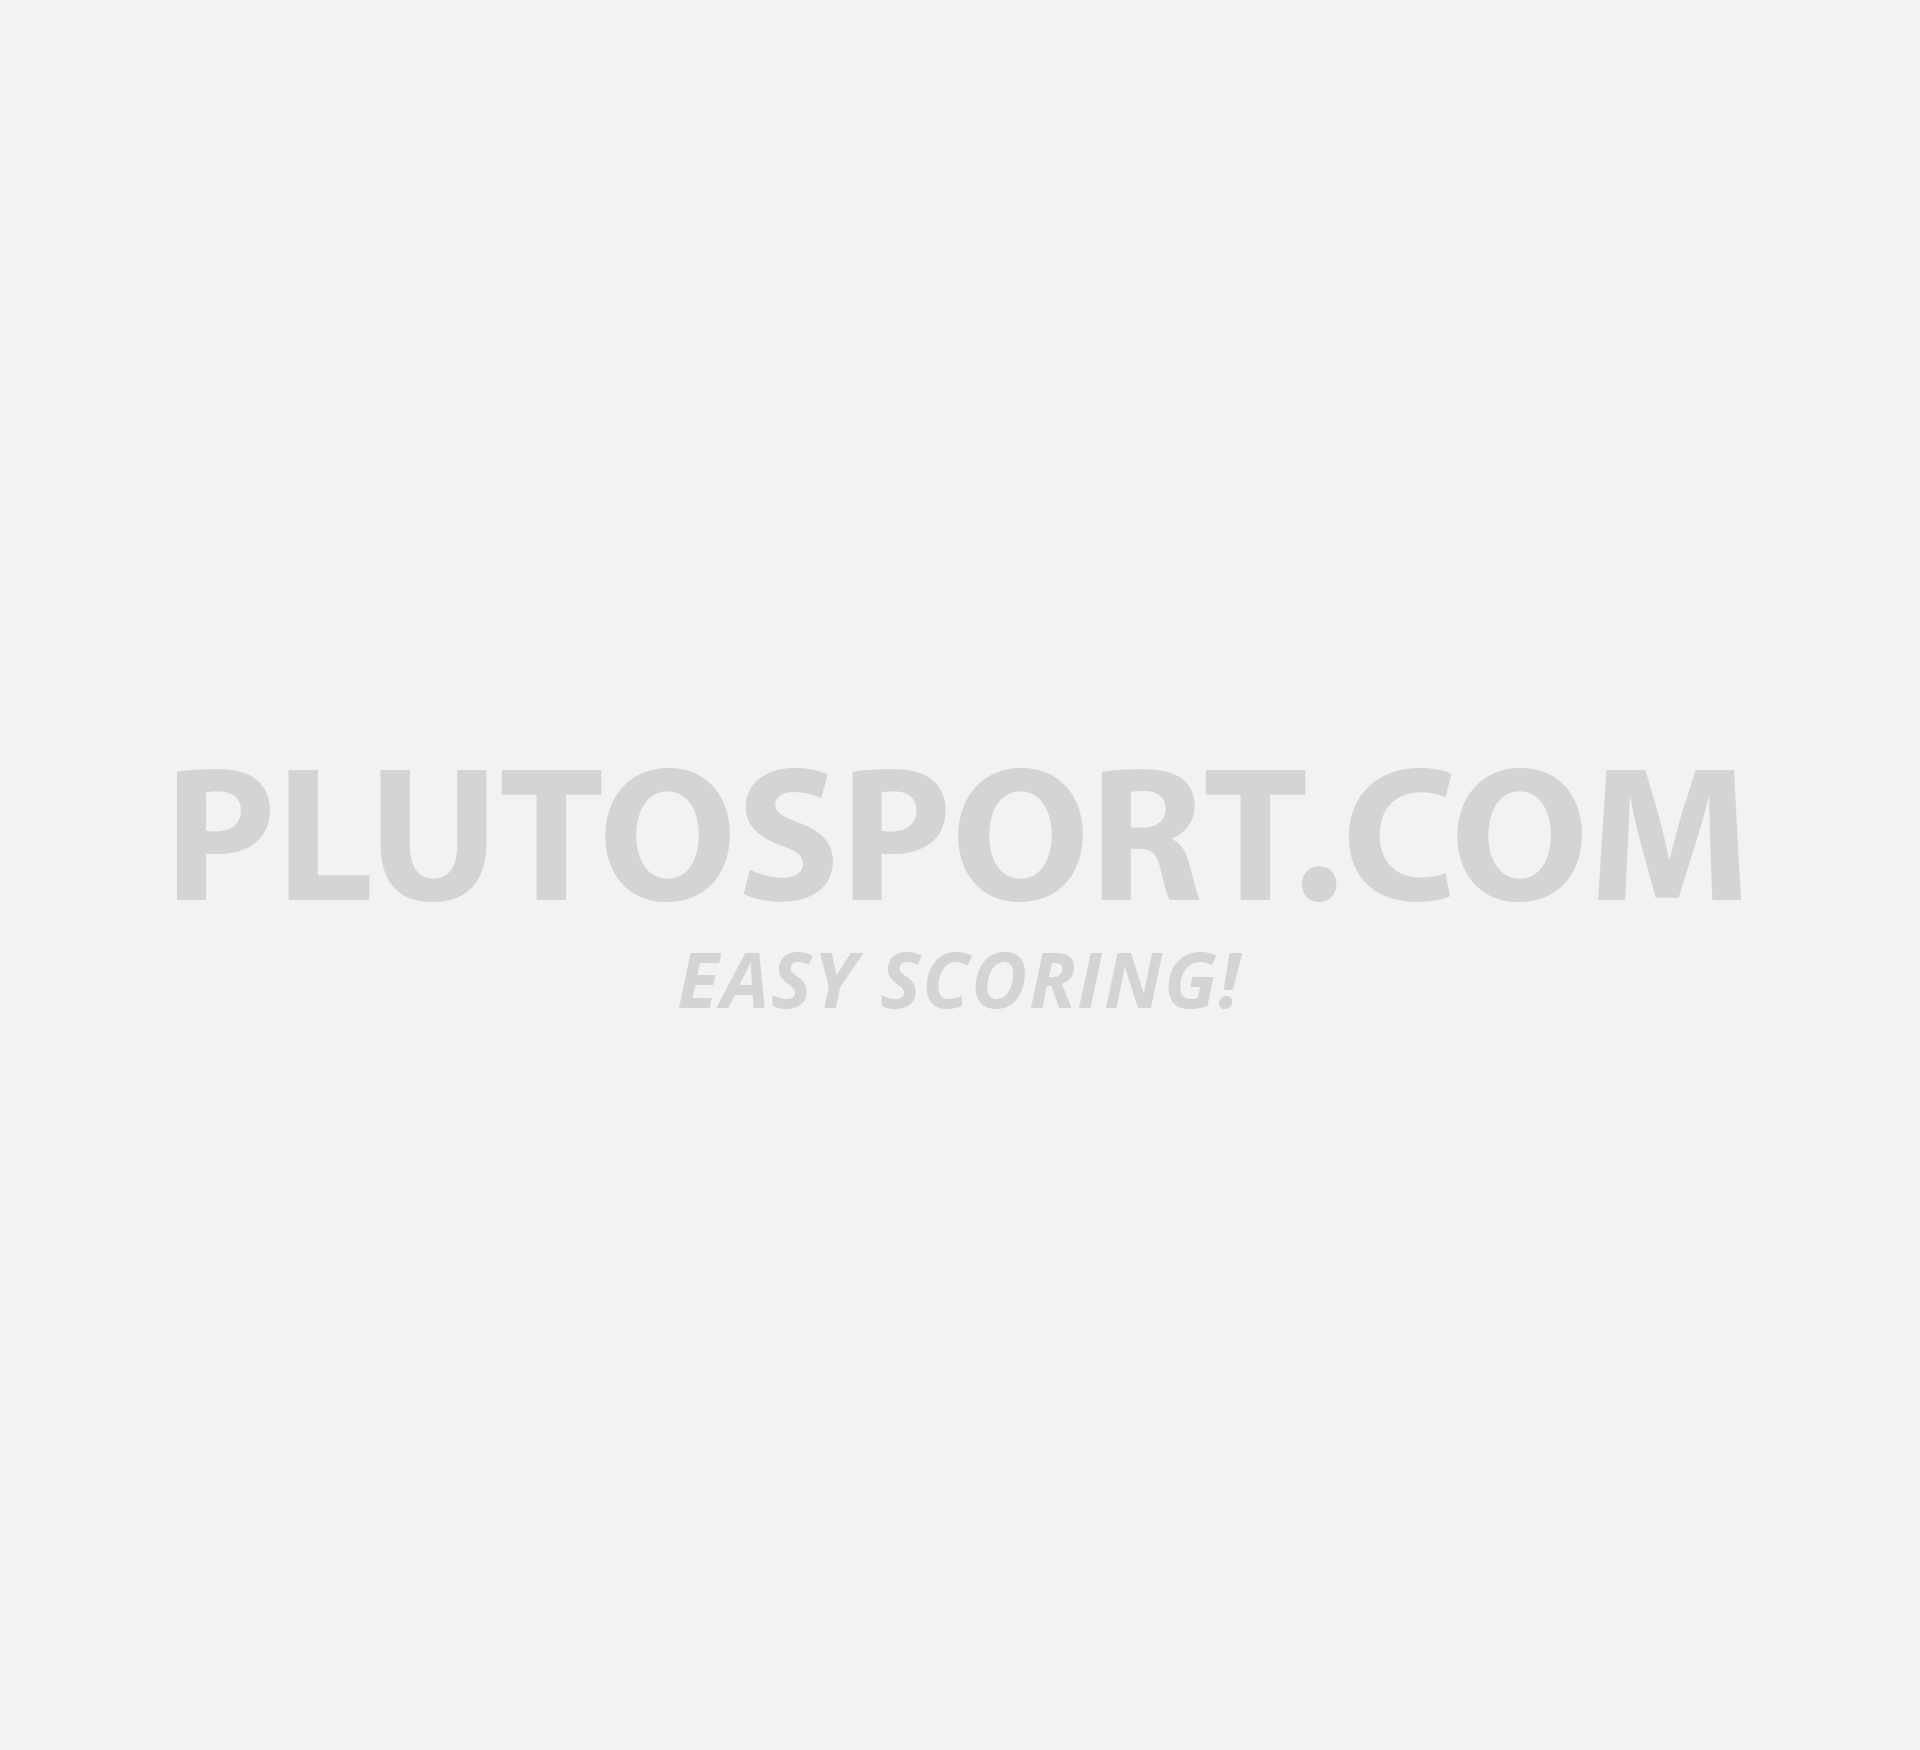 Dunlop Pro Tour (2x 4-can)